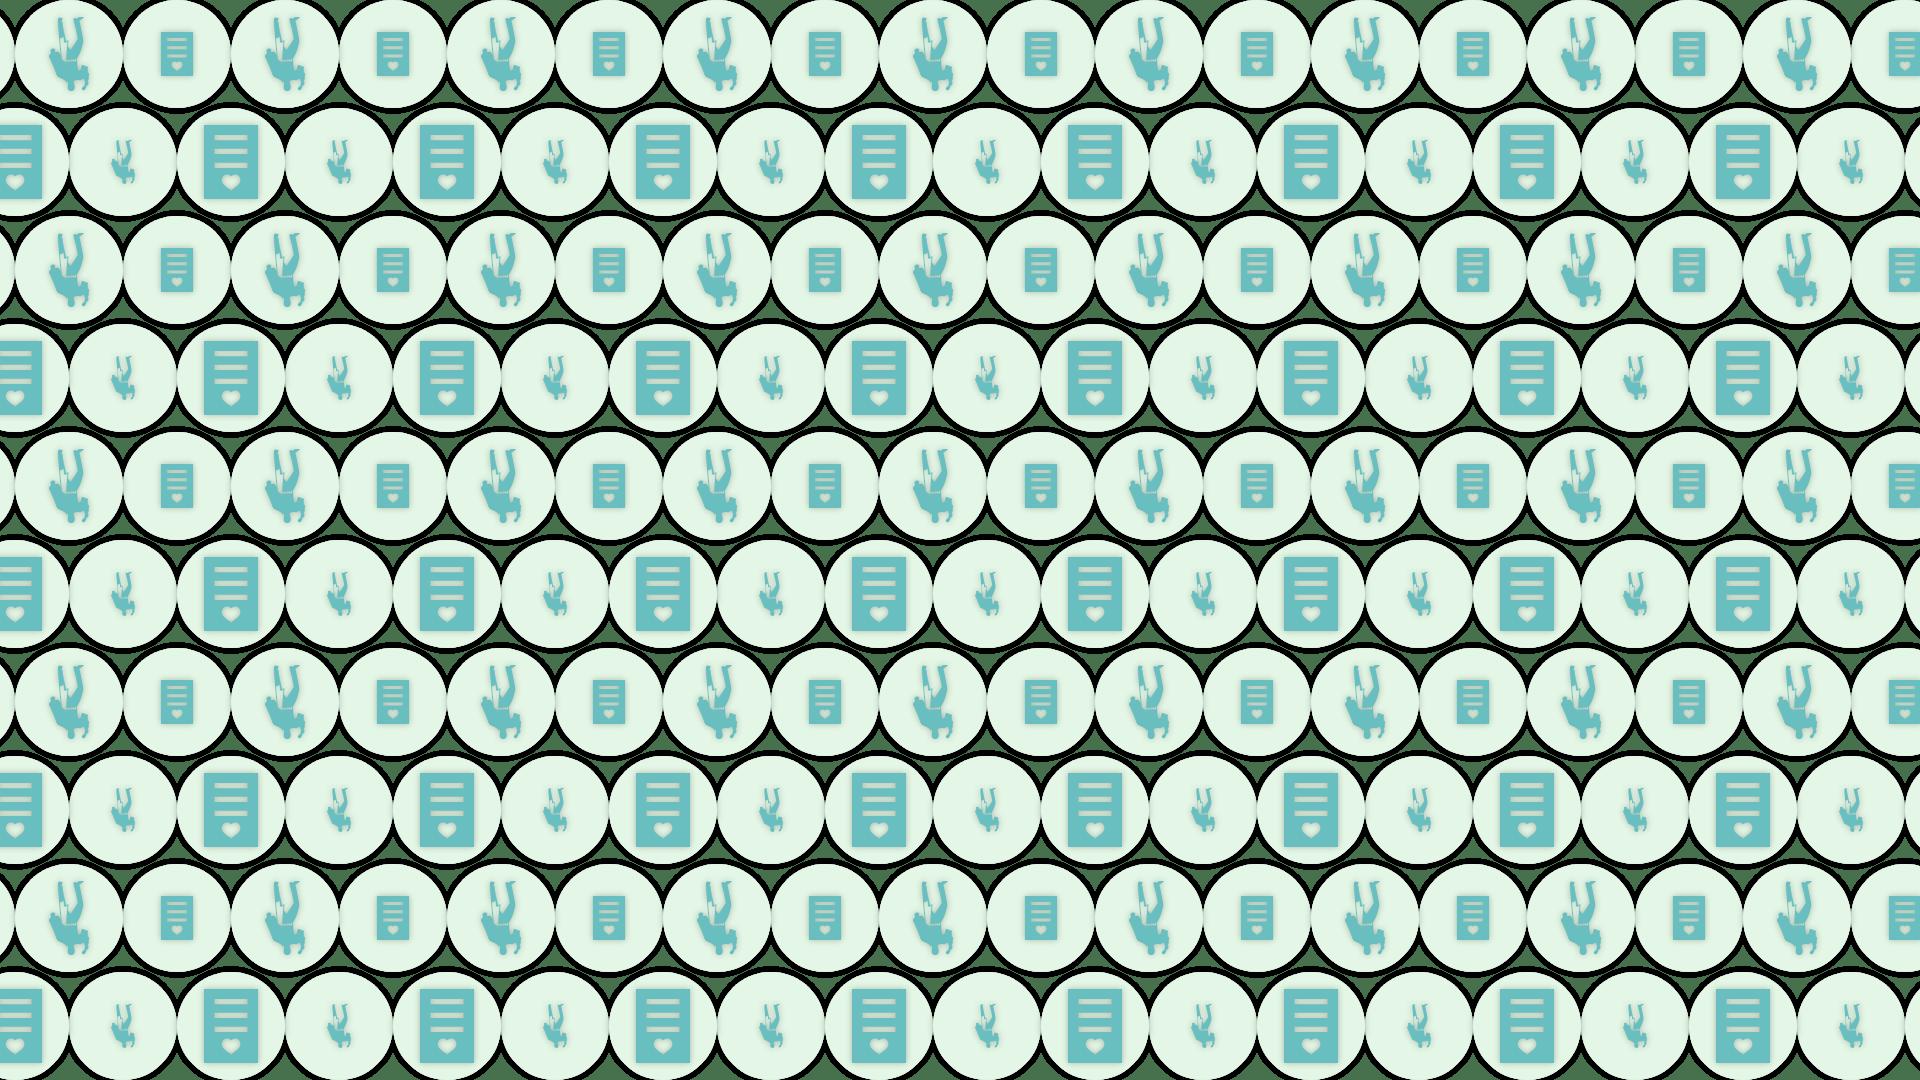 Blue, Aqua, Text, Pattern, Line, Font, Design, Product, Circle, Shapes, Dancer, Top, Drum,  Free Image